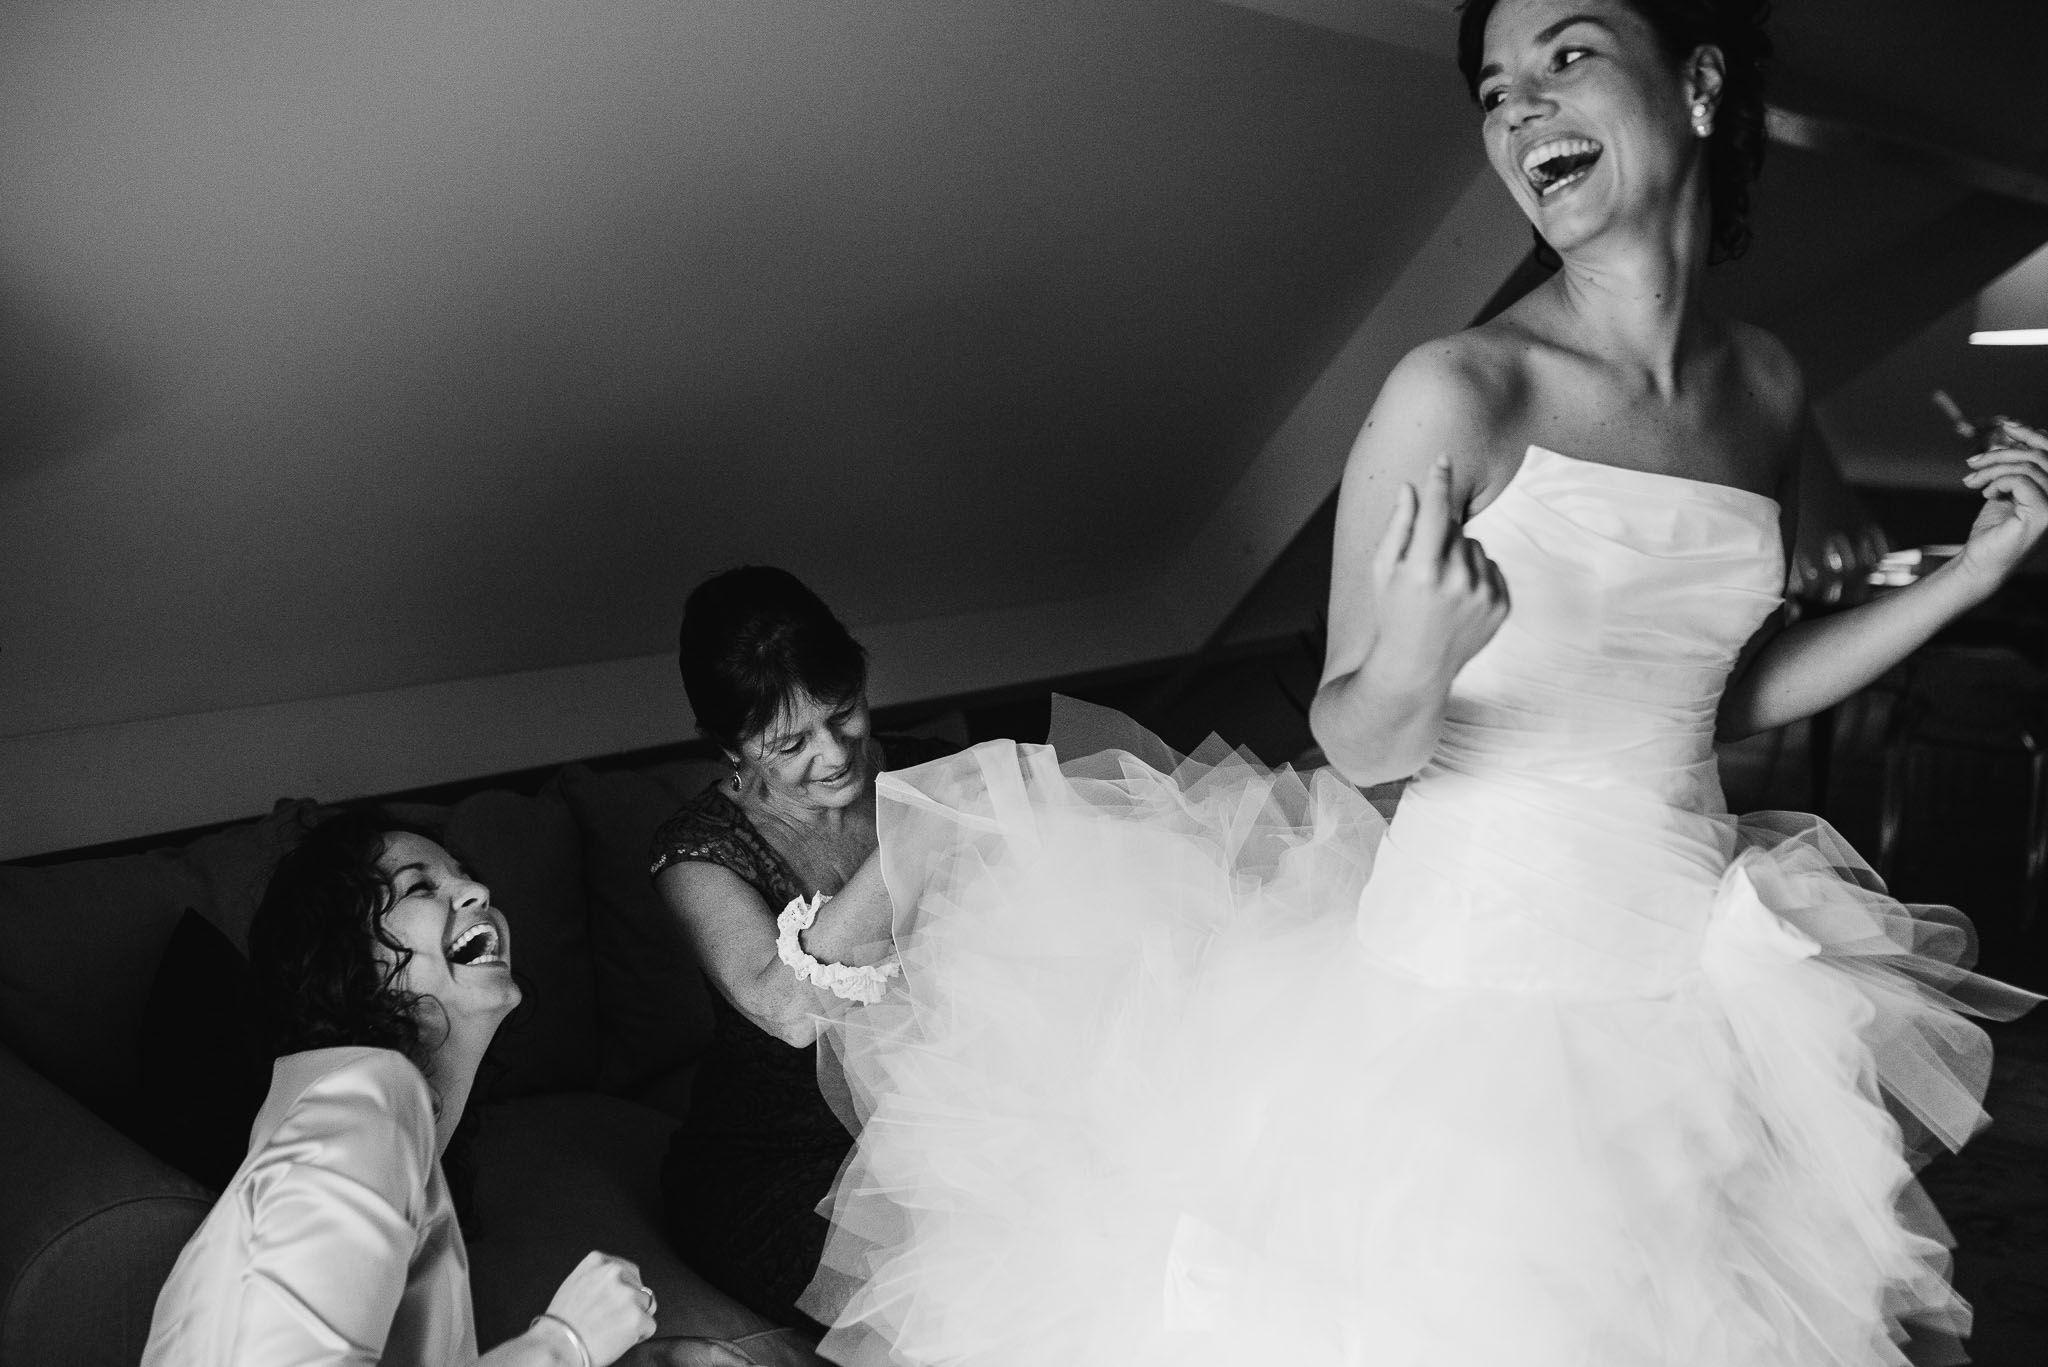 fotograaf bruiloft journalistieke stijl